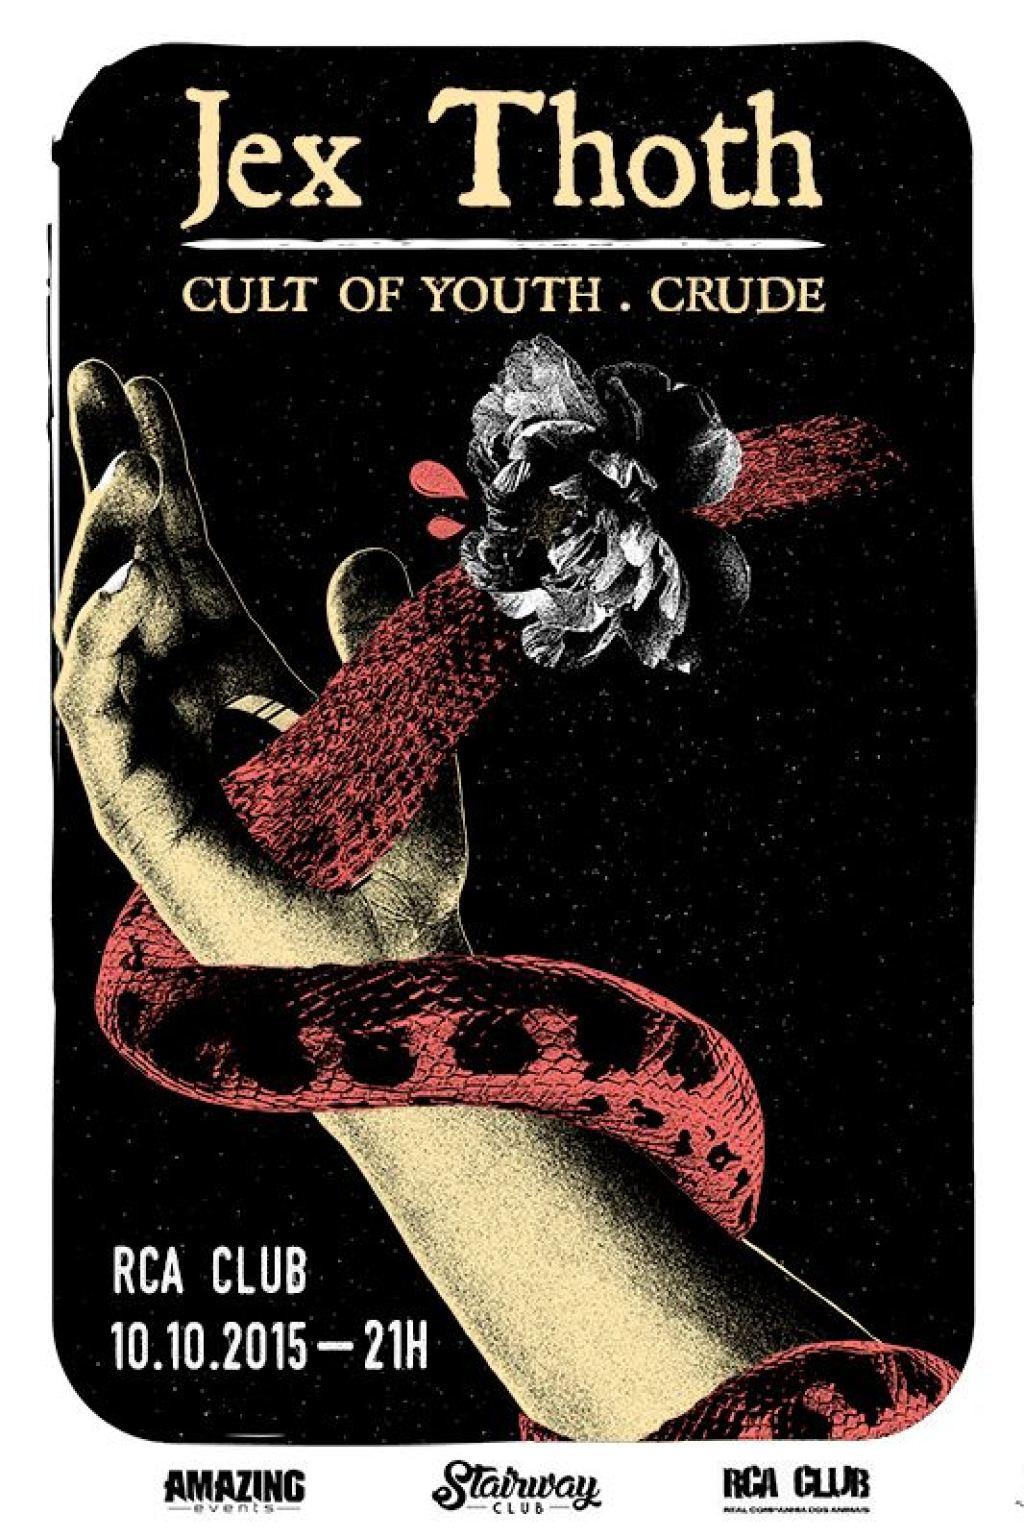 JexThoth-CultofYouth-Crude